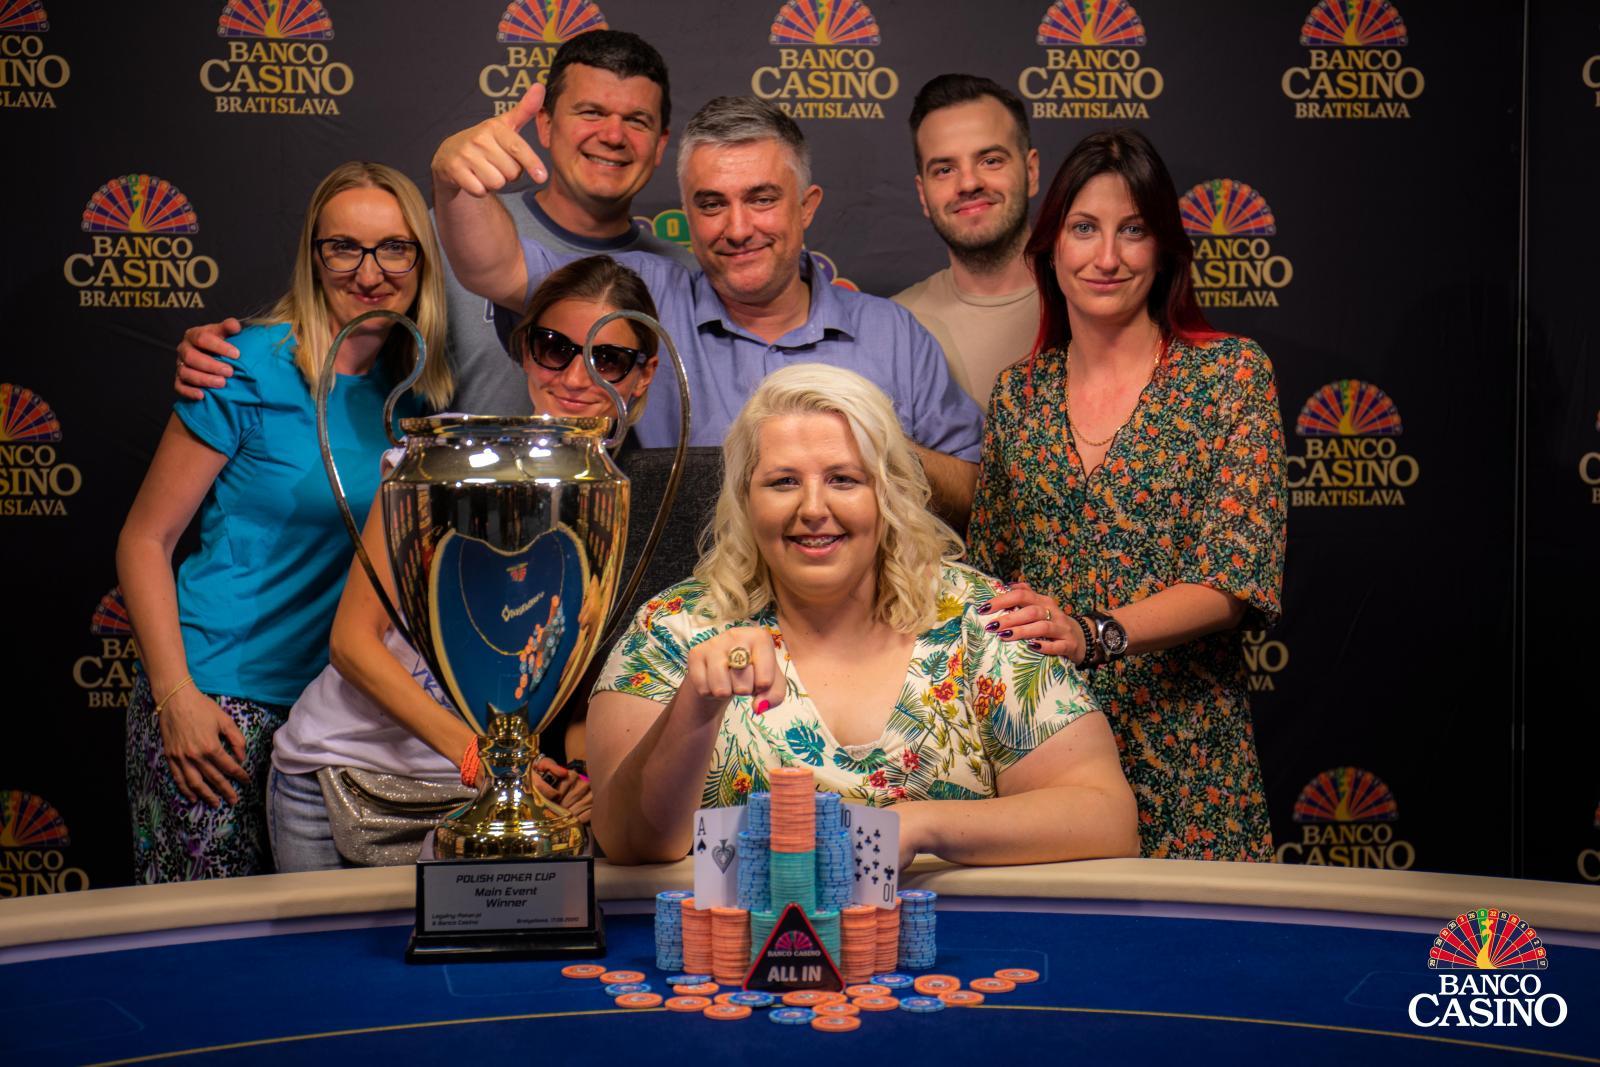 Poker Langsung Agnieszka Kurdwanoska Holt Den Piala Poker Polandia Shows Banco Casino Bratislava Dreamringxperience Com